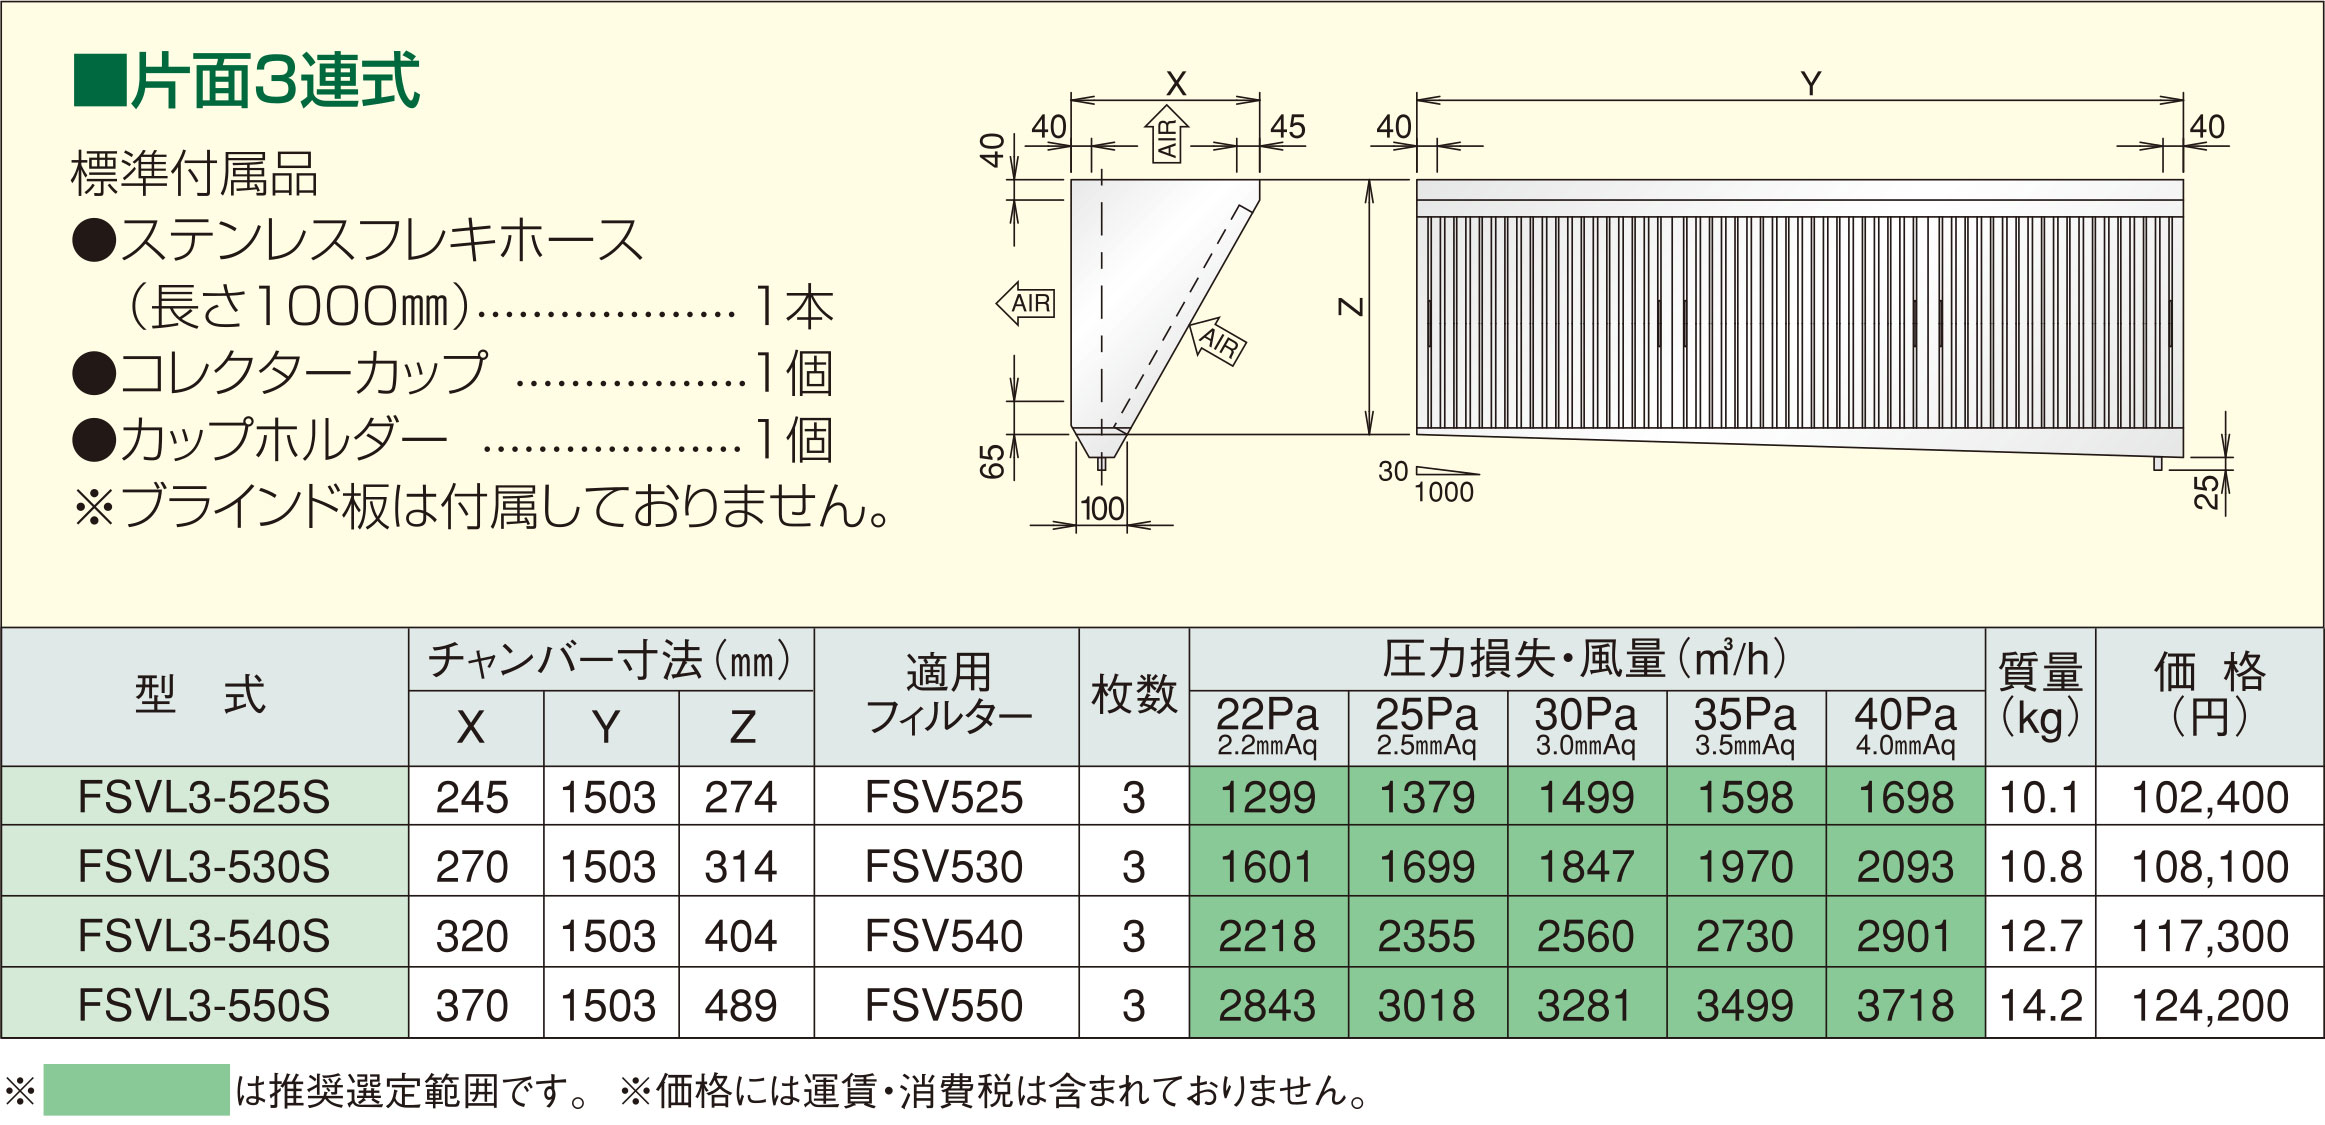 FSVL3-Sシリーズ